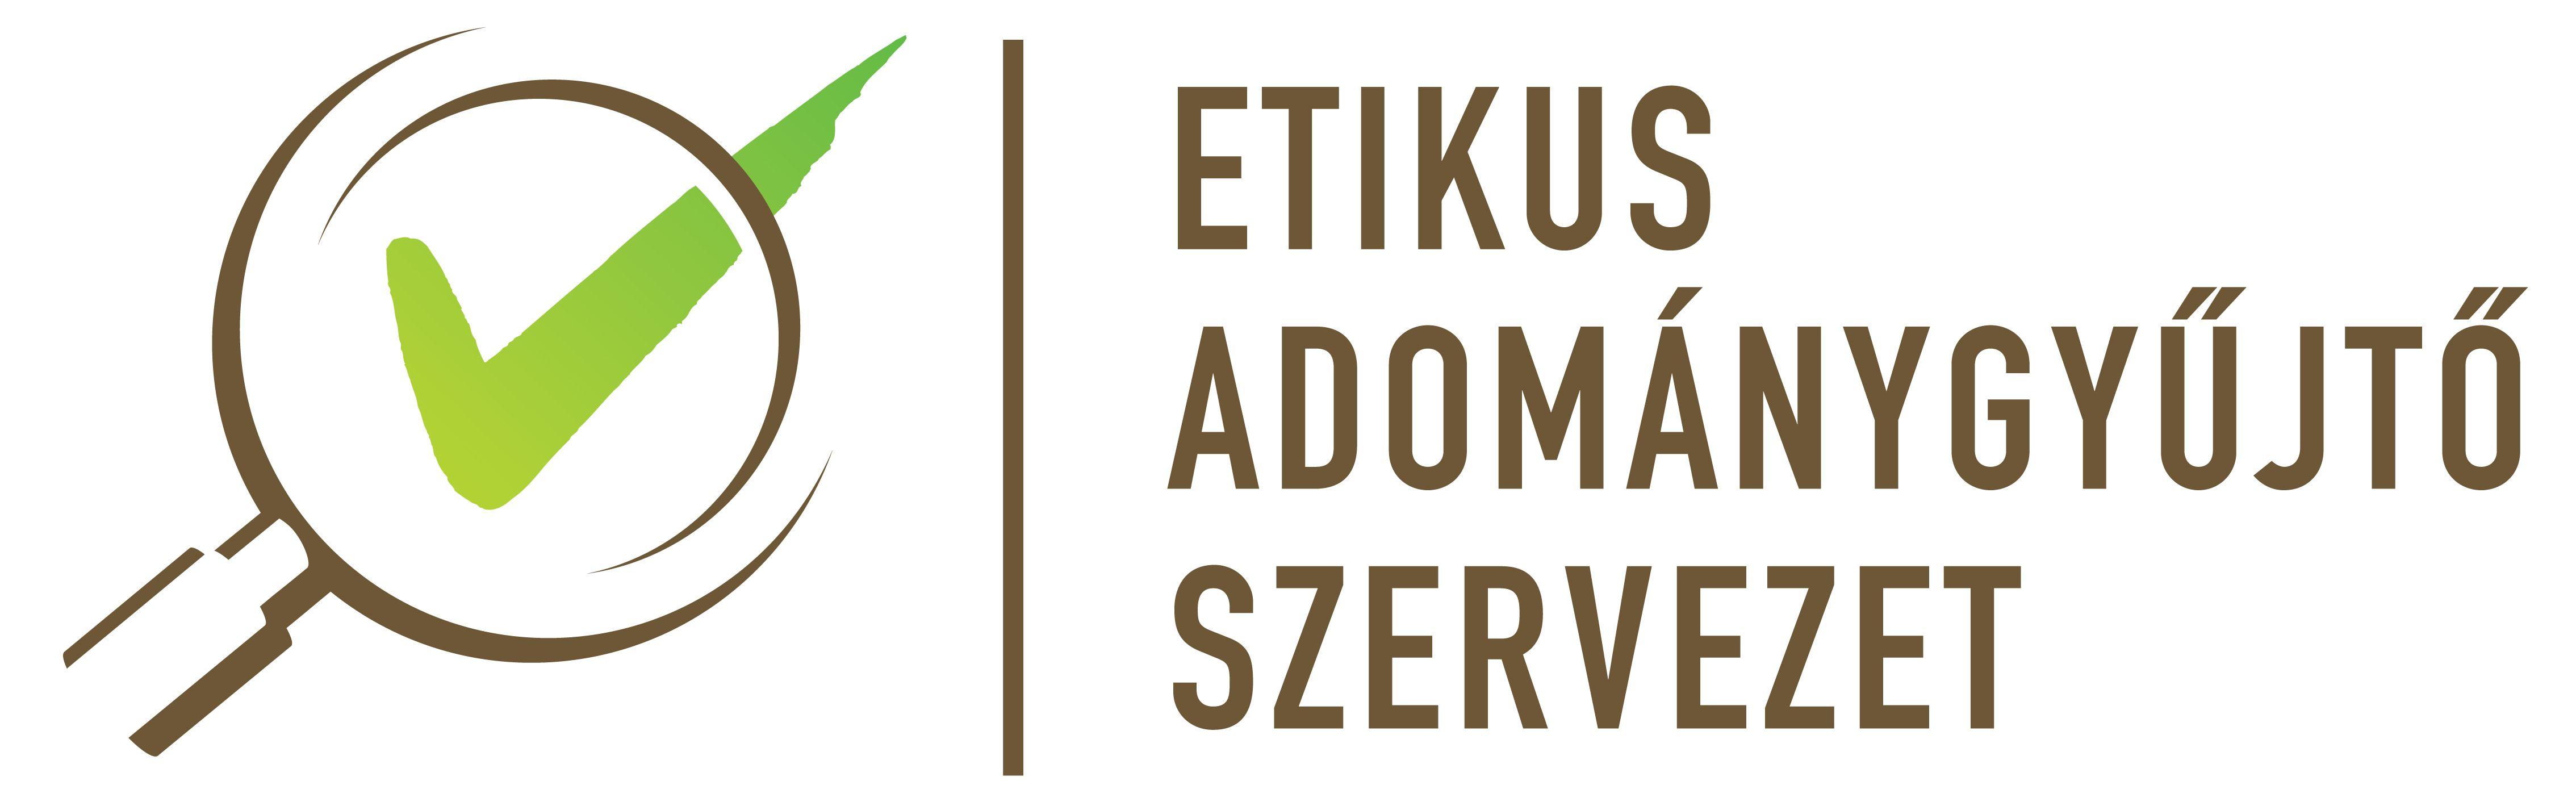 etikusadomanygyujto_logo